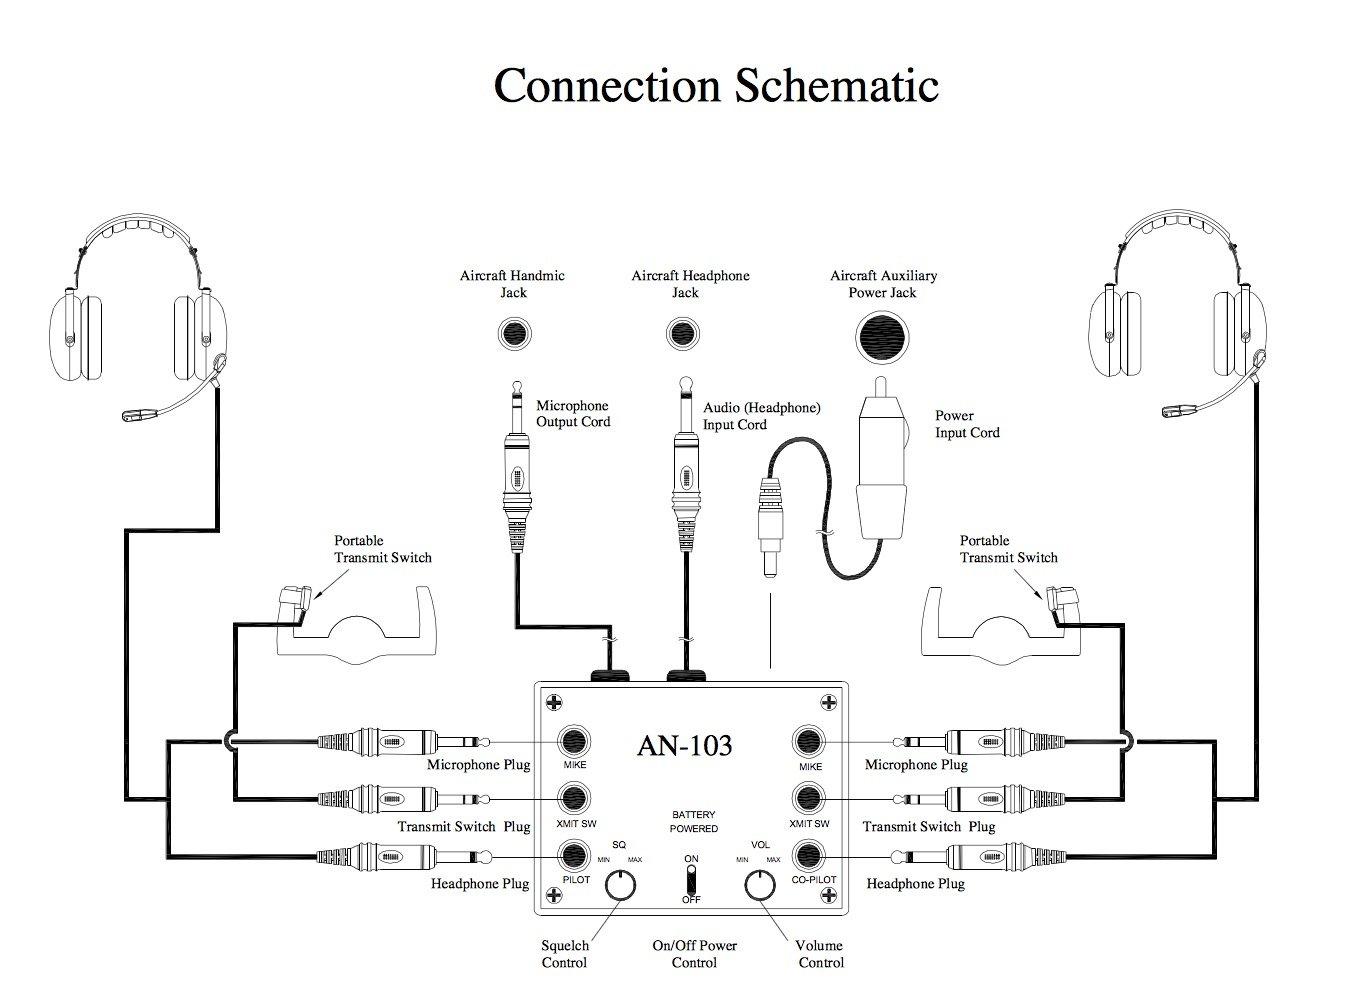 Aviation Headset Jack Wiring Diagram Free Download Headphone Plug Aircraft Info U2022 At